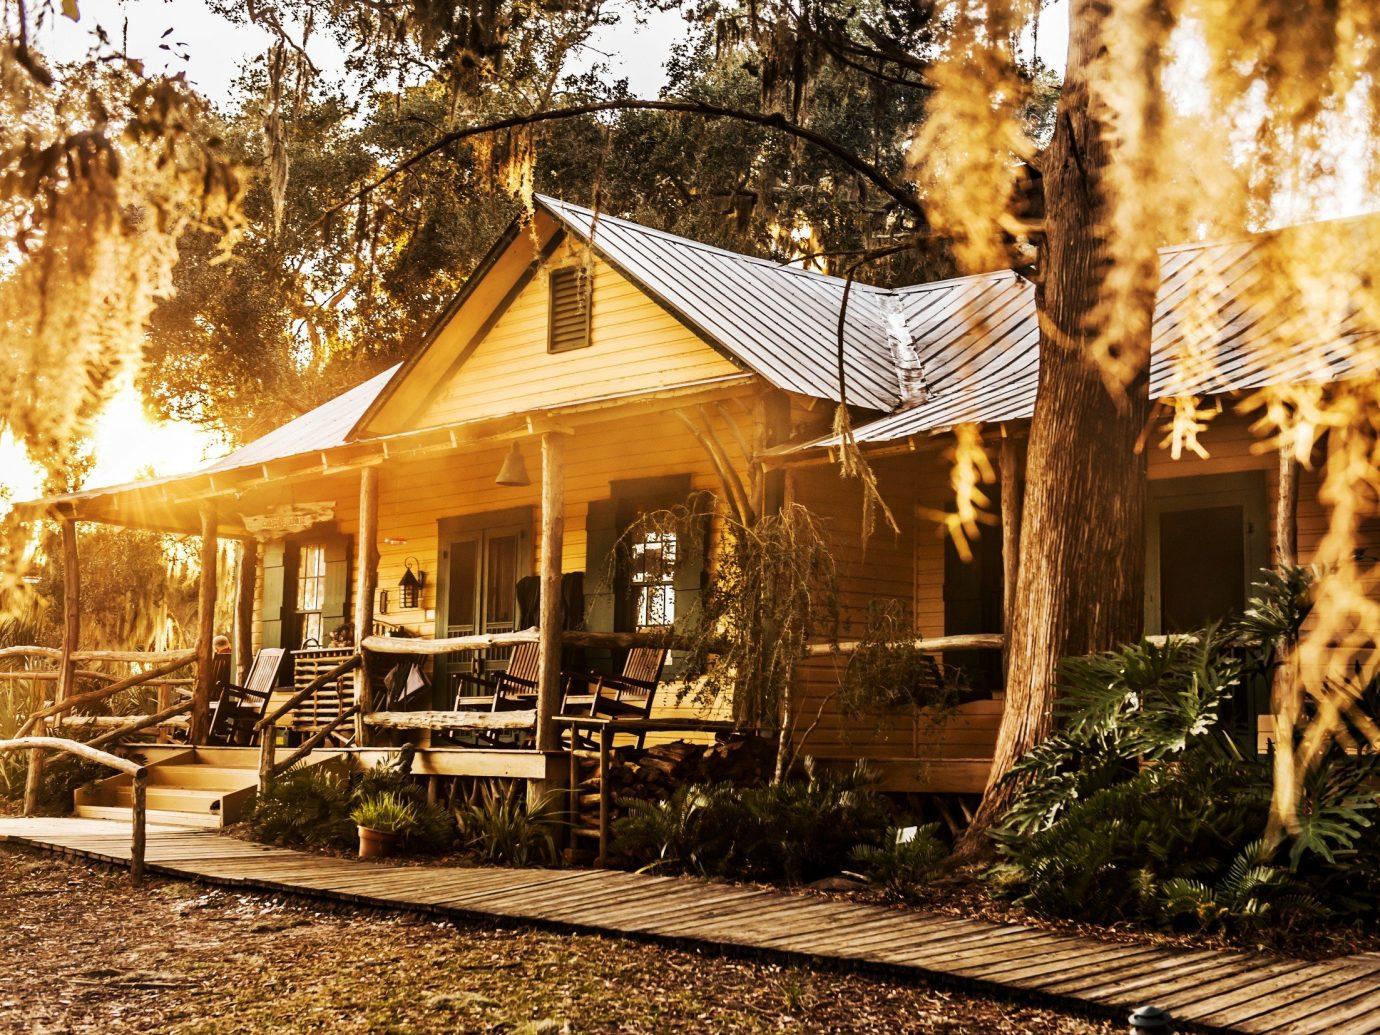 Hotels tree outdoor house home log cabin hut Resort